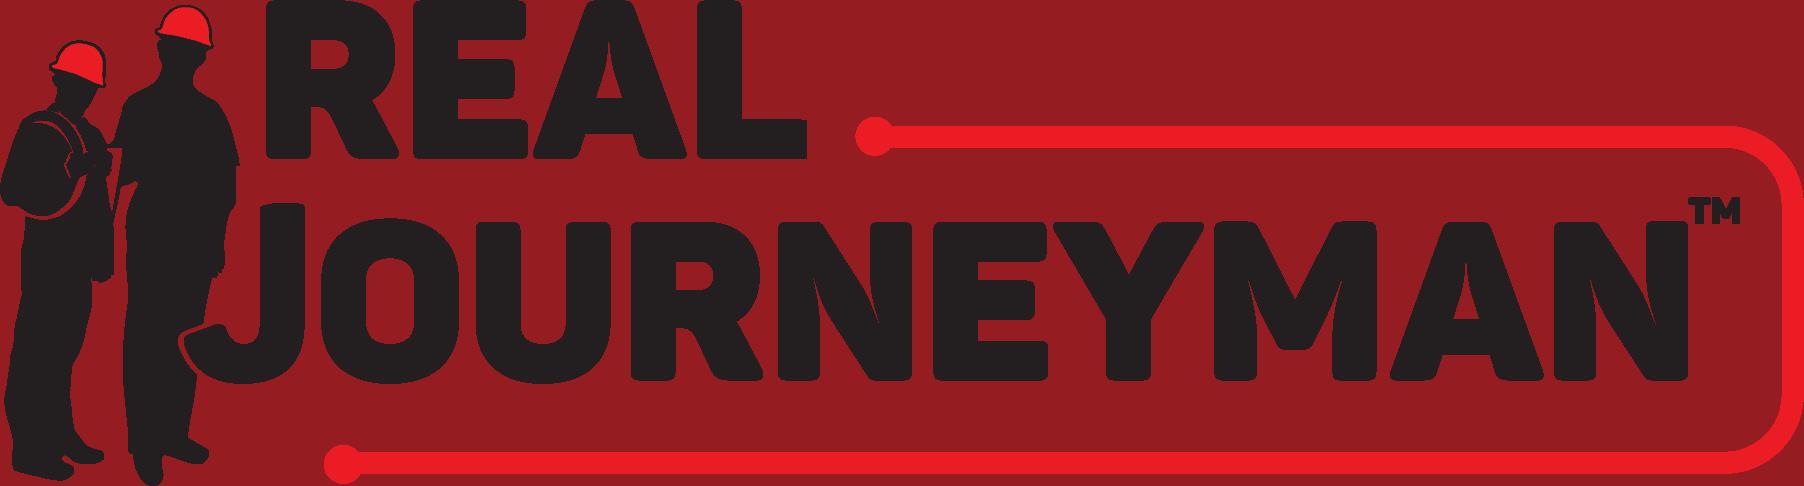 Real Journeyman